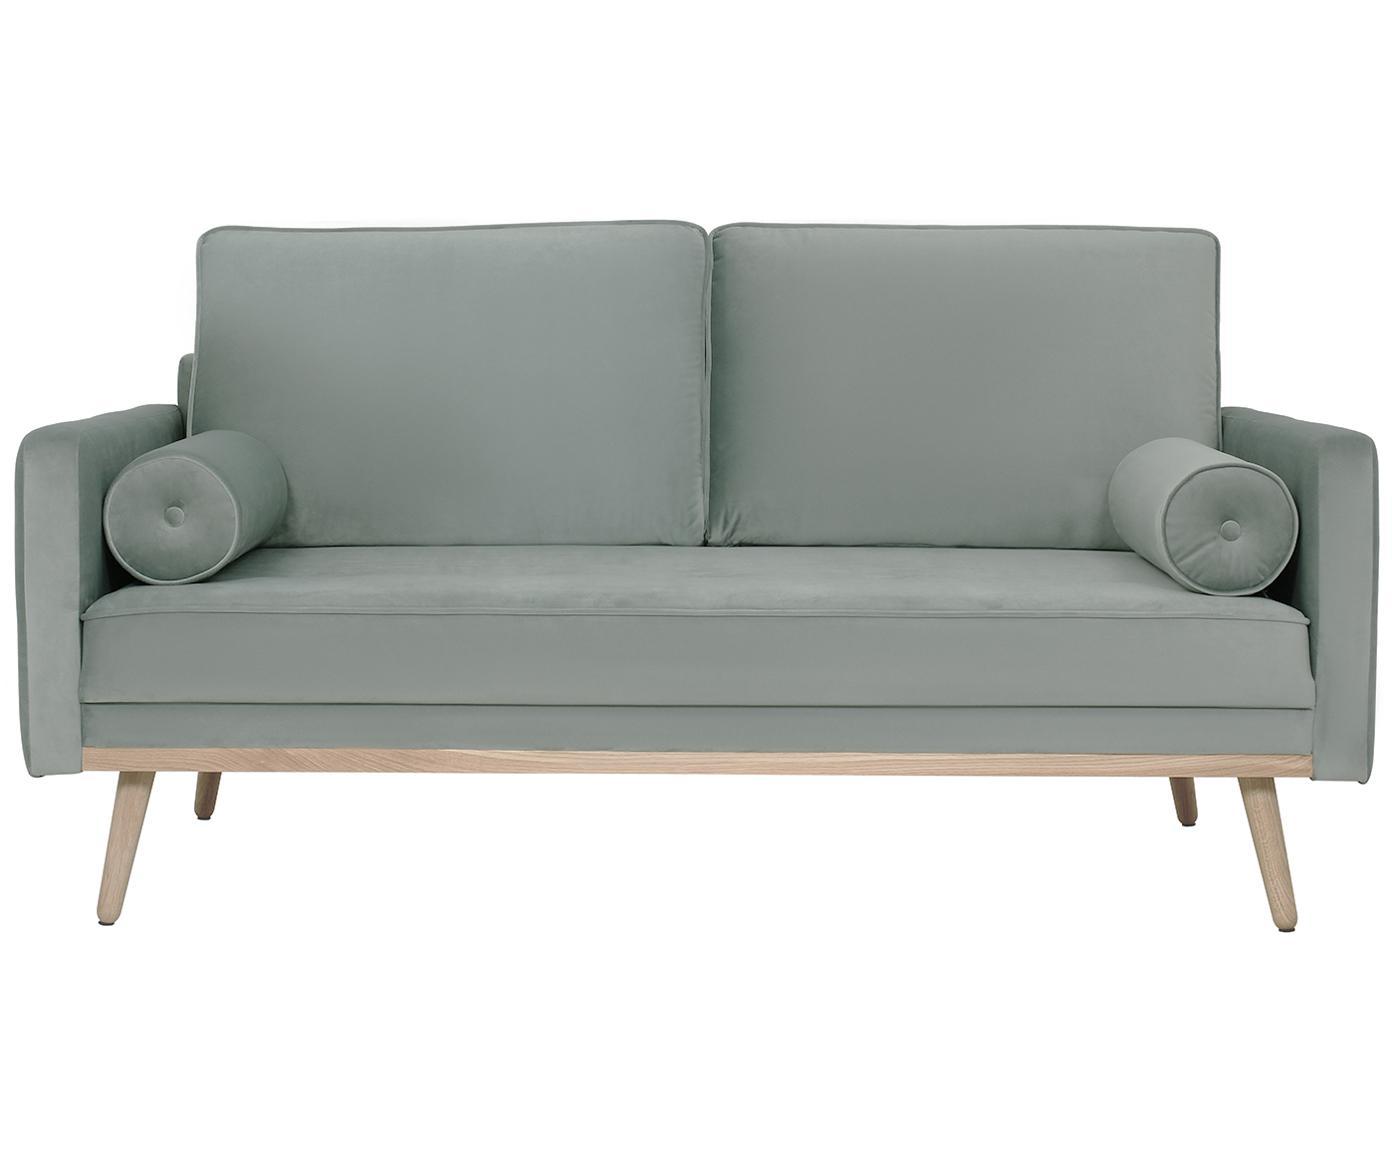 Samt-Sofa Saint (2-Sitzer), Bezug: Samt (Polyester) 35.000 S, Gestell: Massives Kiefernholz, Spa, Samt Salbeifarben, B 169 x T 87 cm